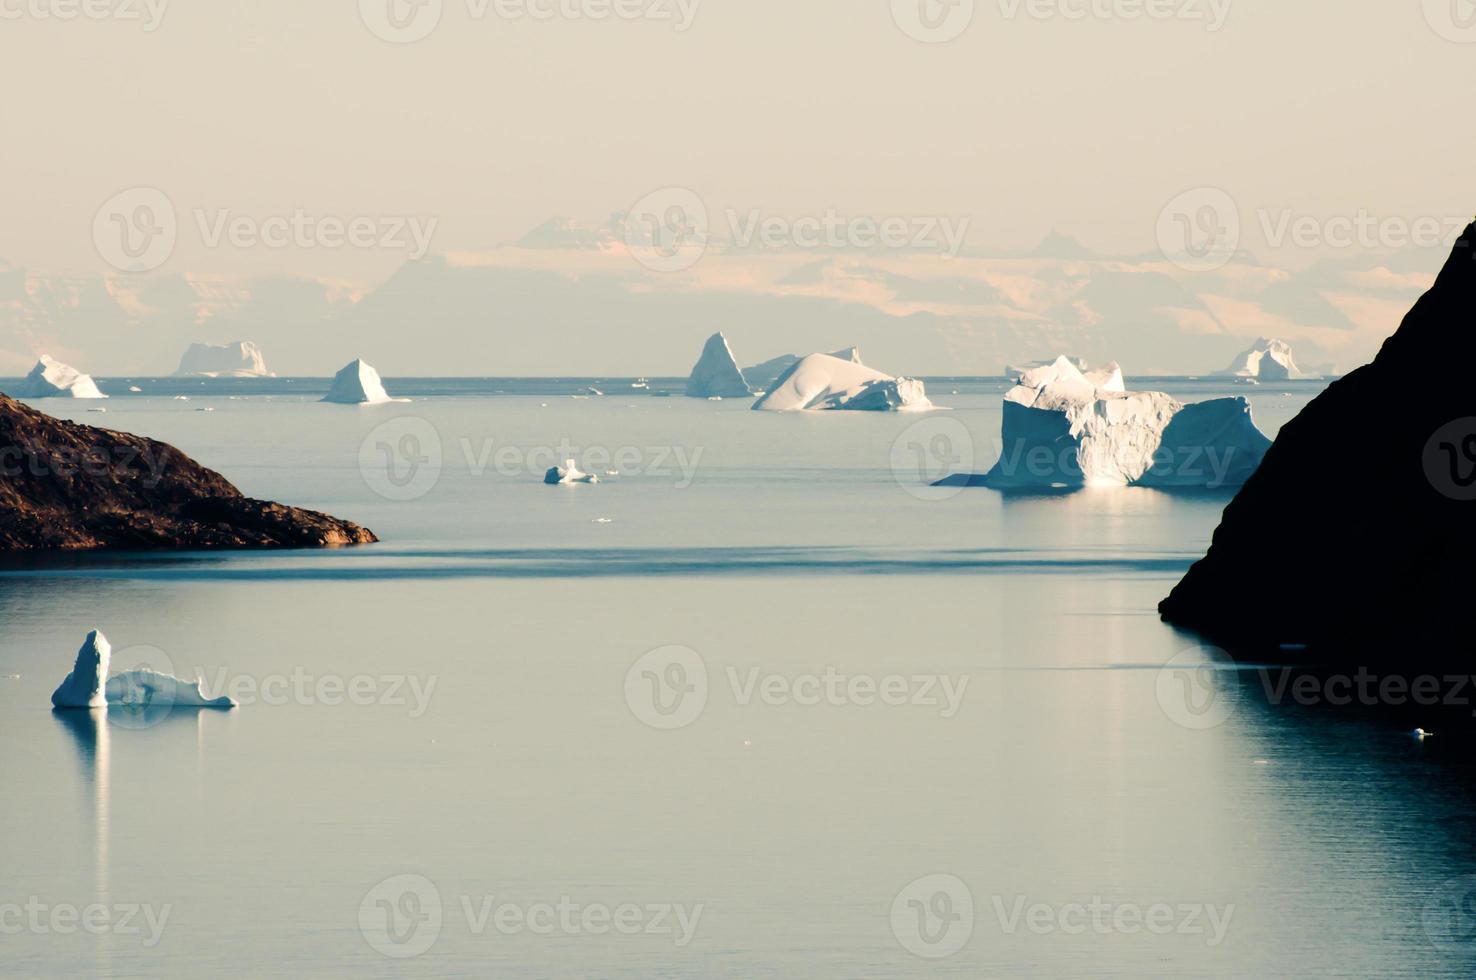 Scoreby Sound - Groenlandia foto